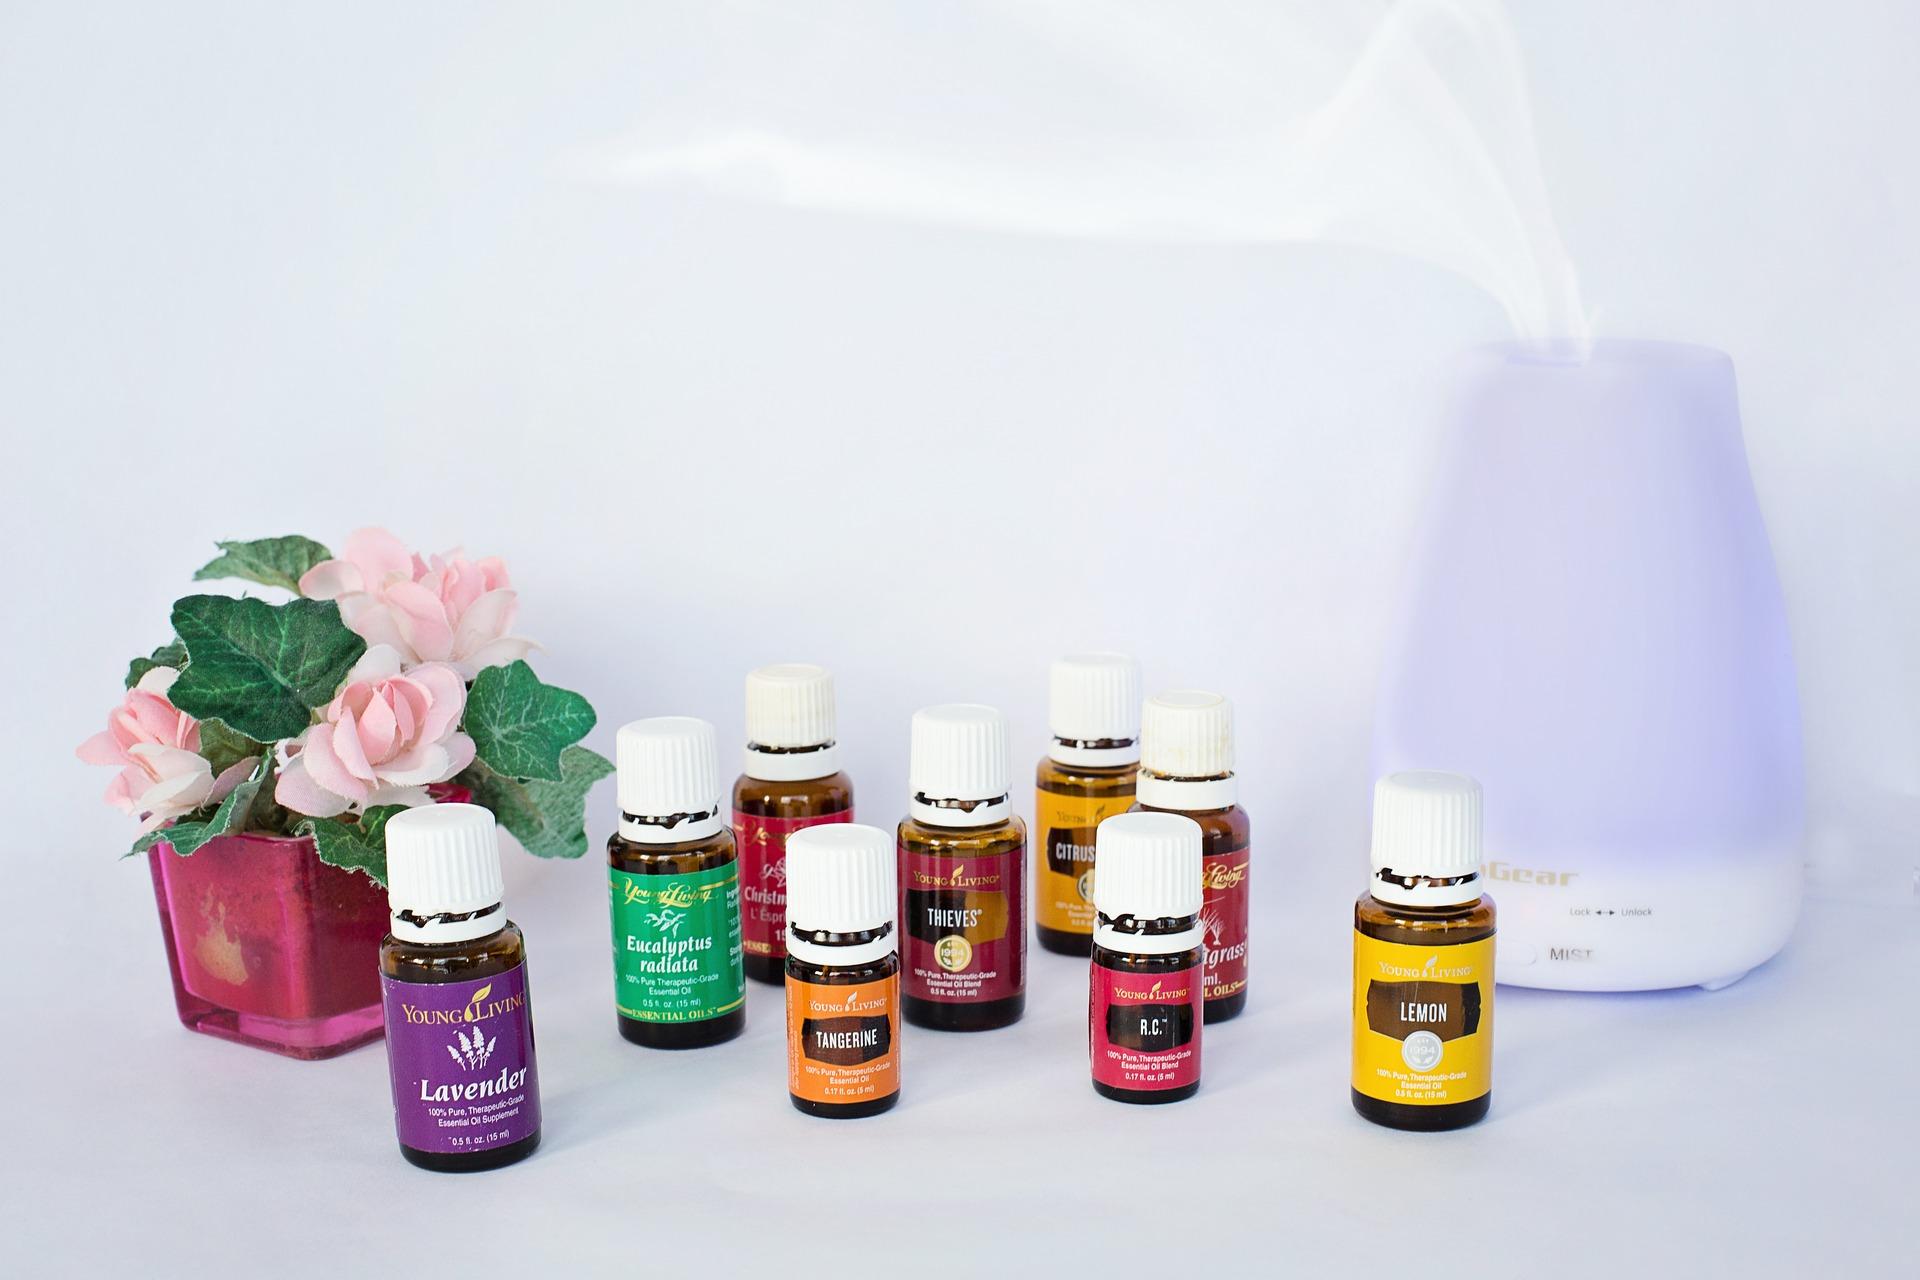 Diffuseur huiles essentielles